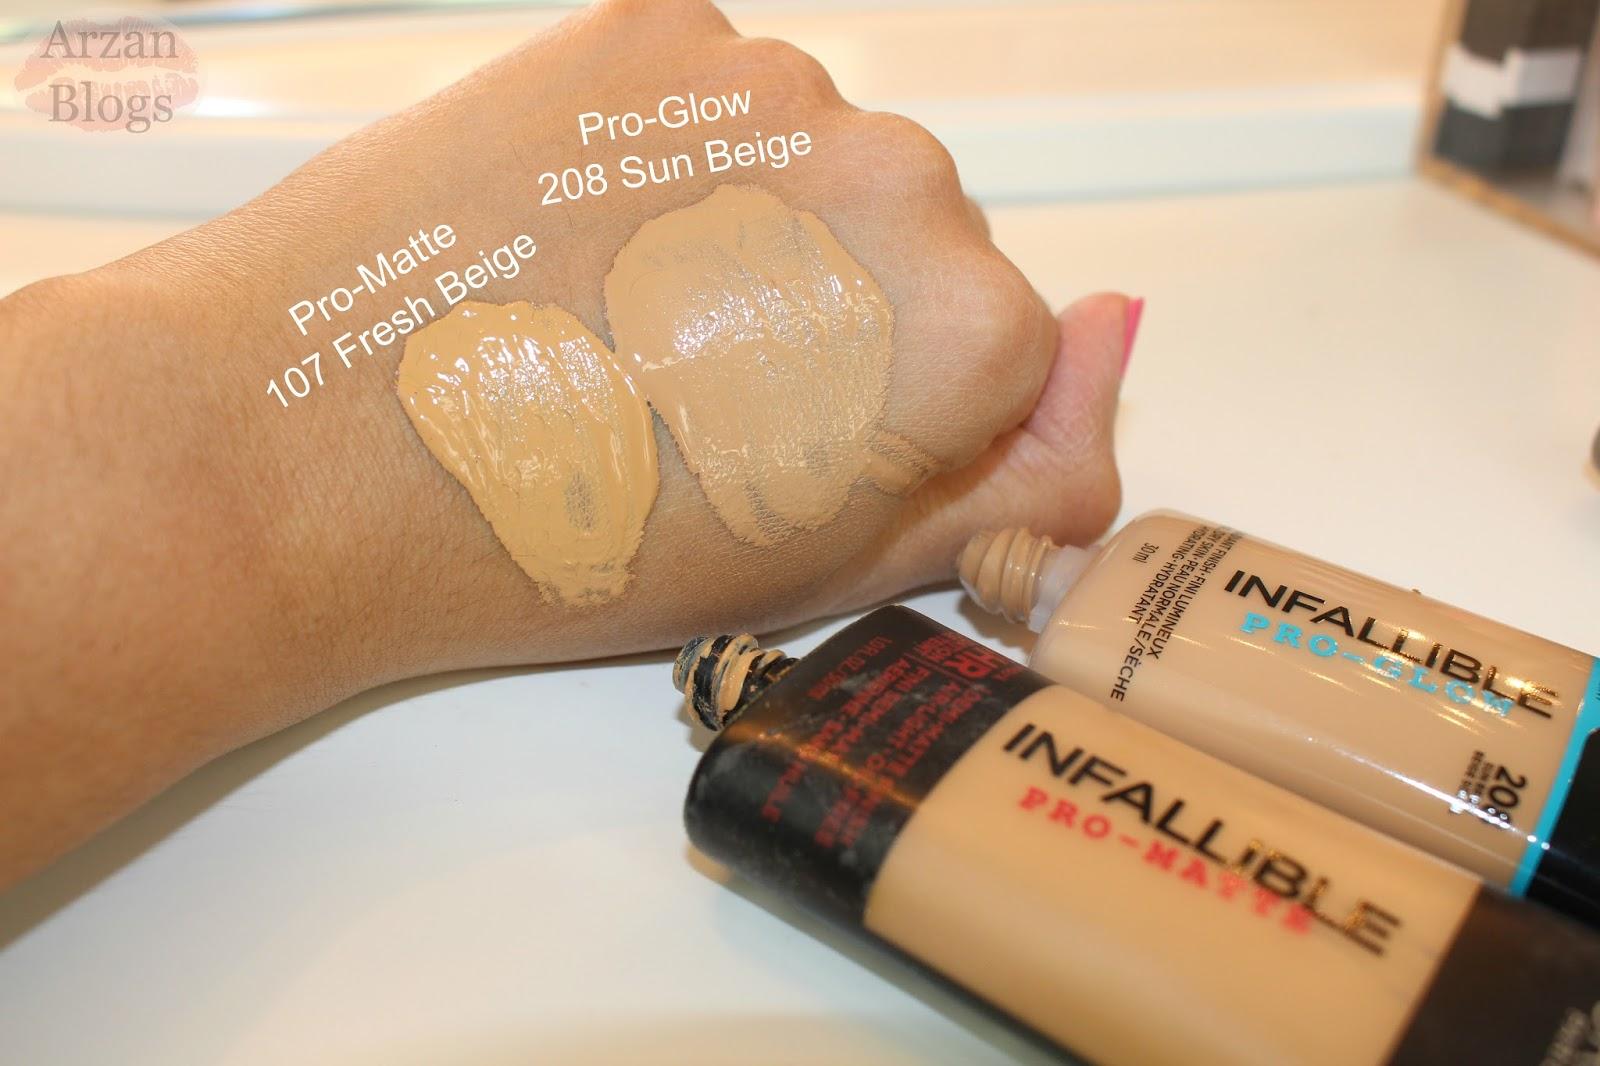 Infallible Pro-Matte Liquid Longwear Foundation by L'Oreal #21